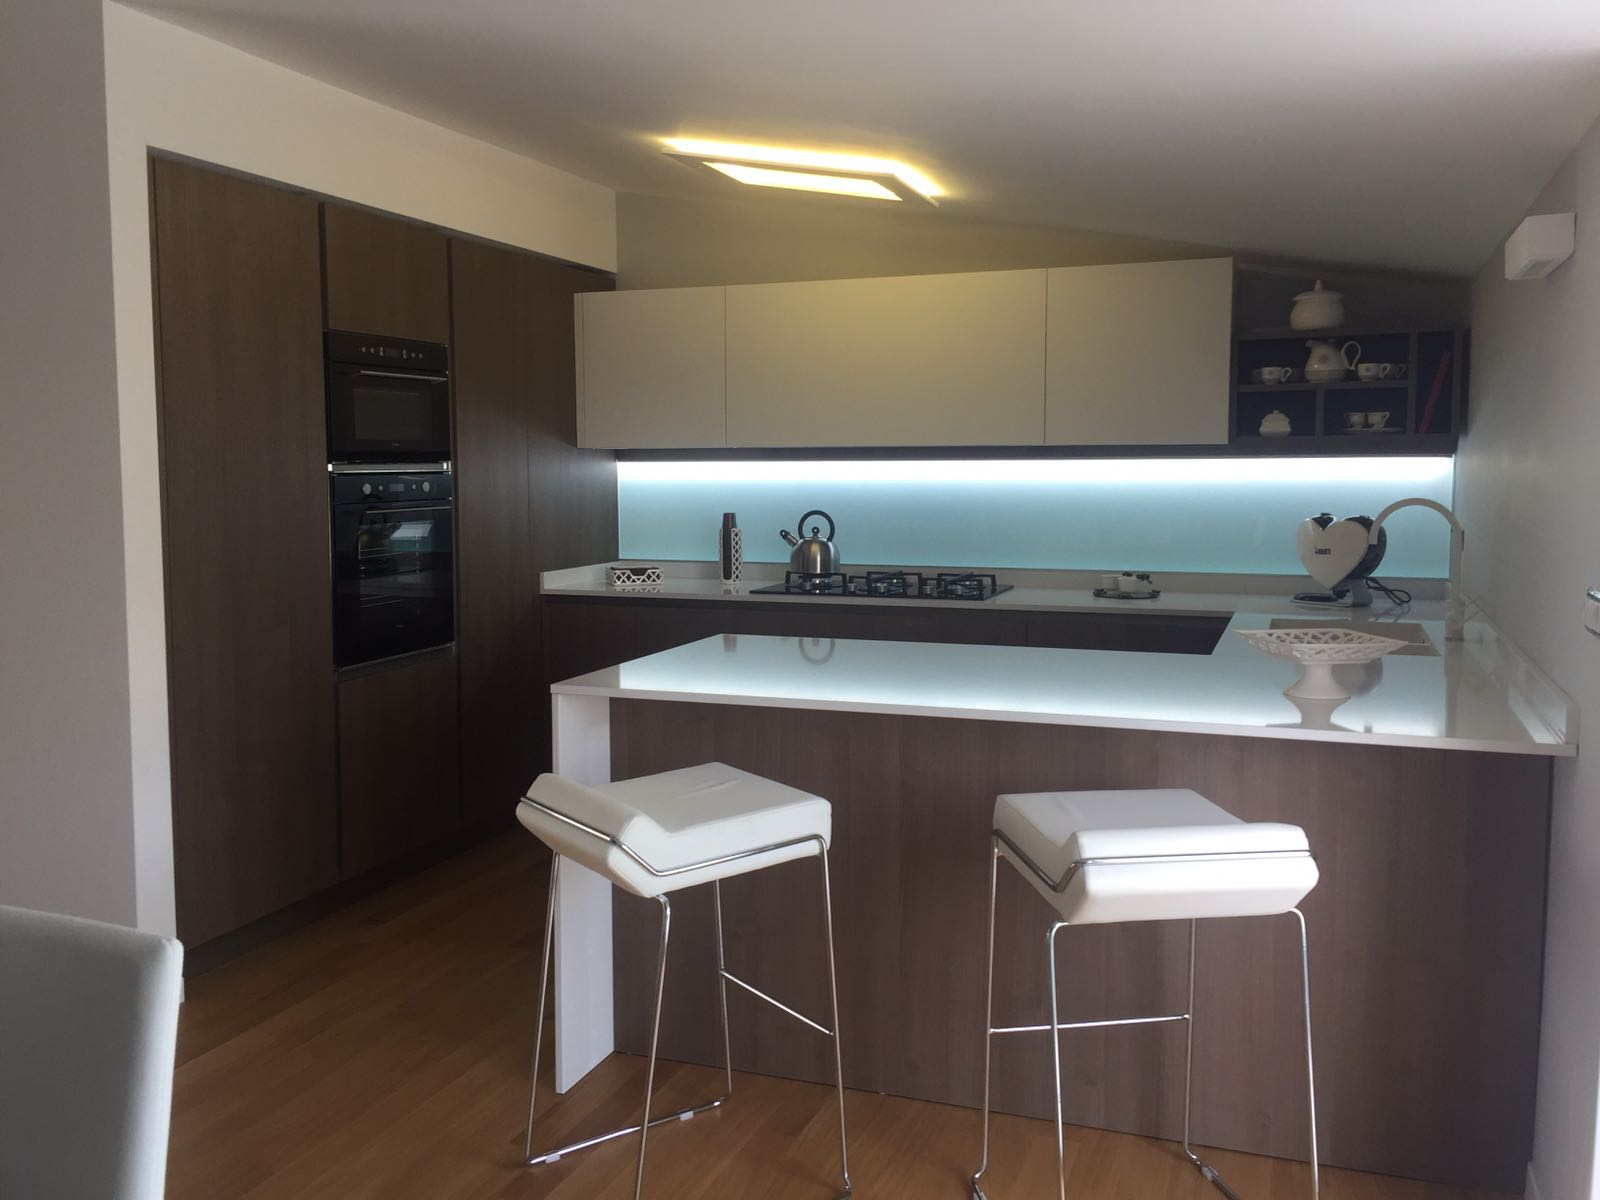 Veneta Cucine Assistenza Clienti.Una Veneta Cucine Oyster Pro Per La Calda Casa Di Laura E Arturo